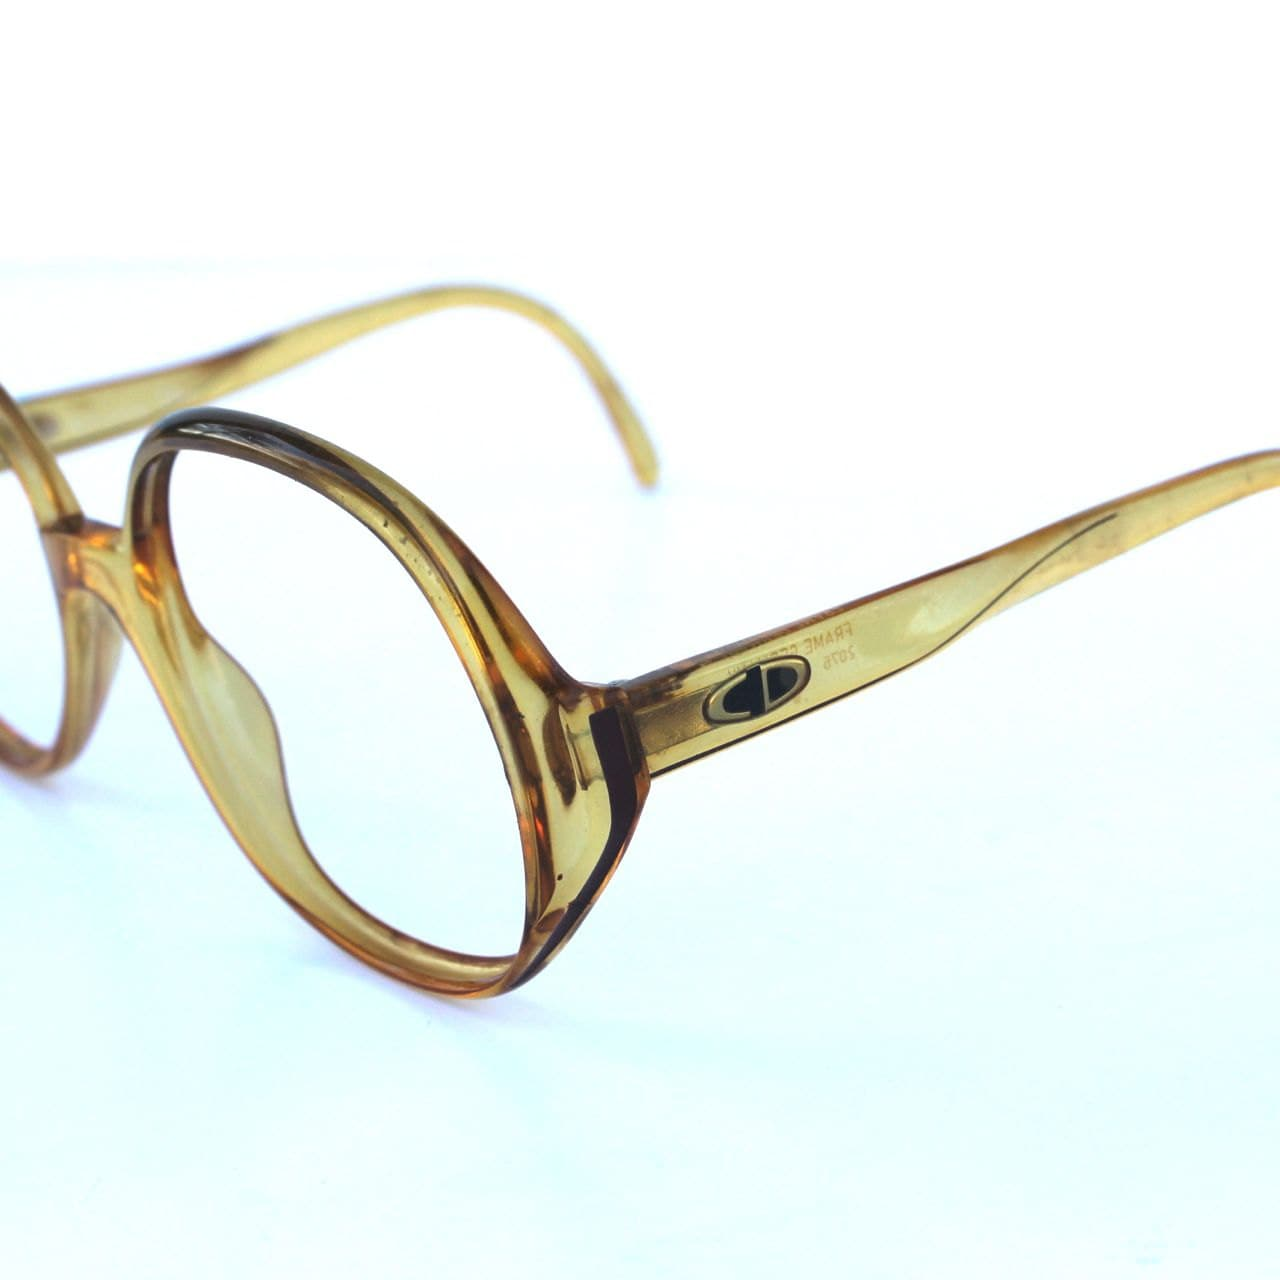 Christian Dior Vintage Circular Caramel Glasses Frames ...